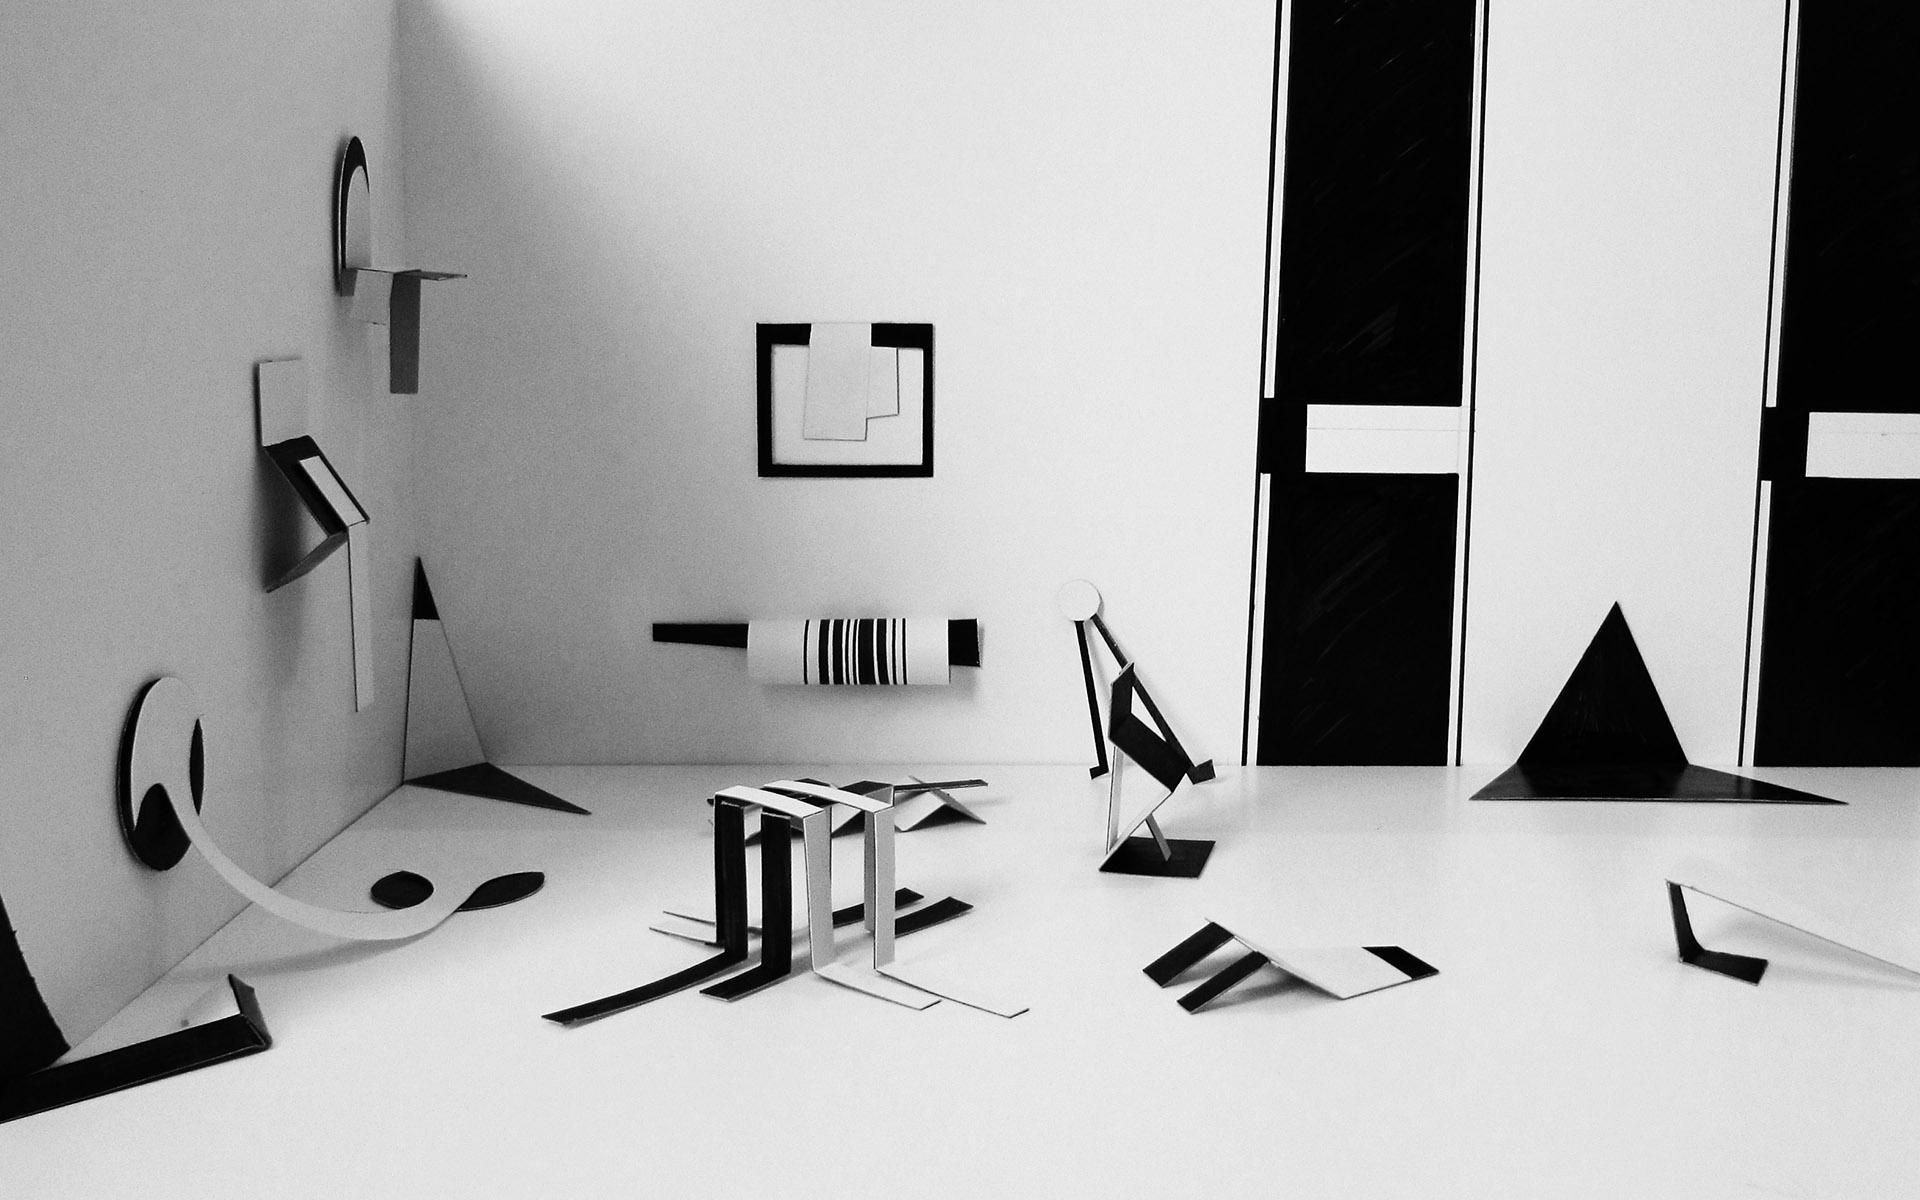 Frontpage 1 | Liat Klein